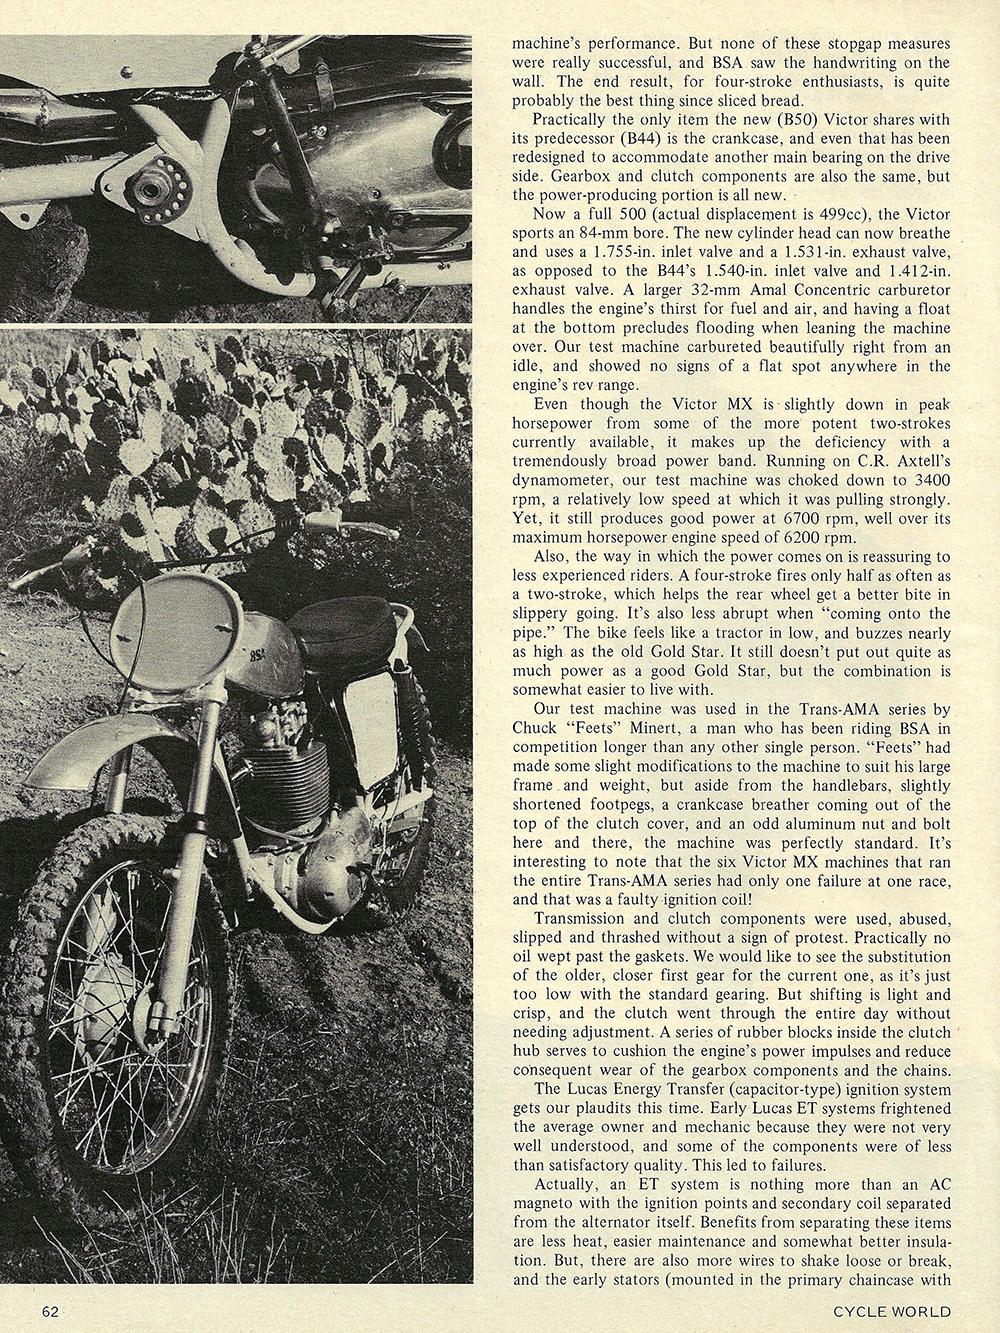 1971 BSA Victor MX road test 03.jpg